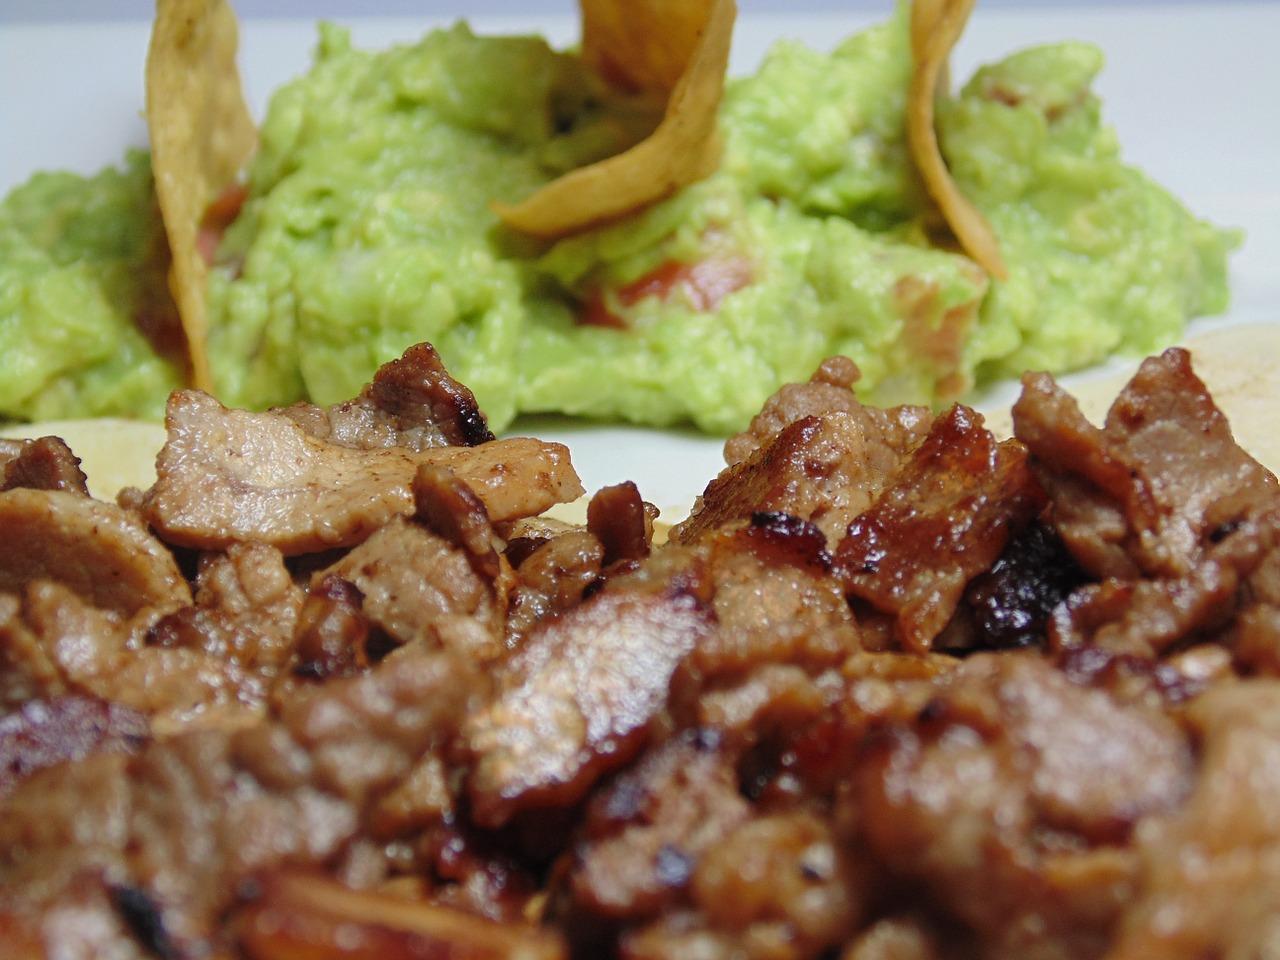 Pork Carnitas with guacamole